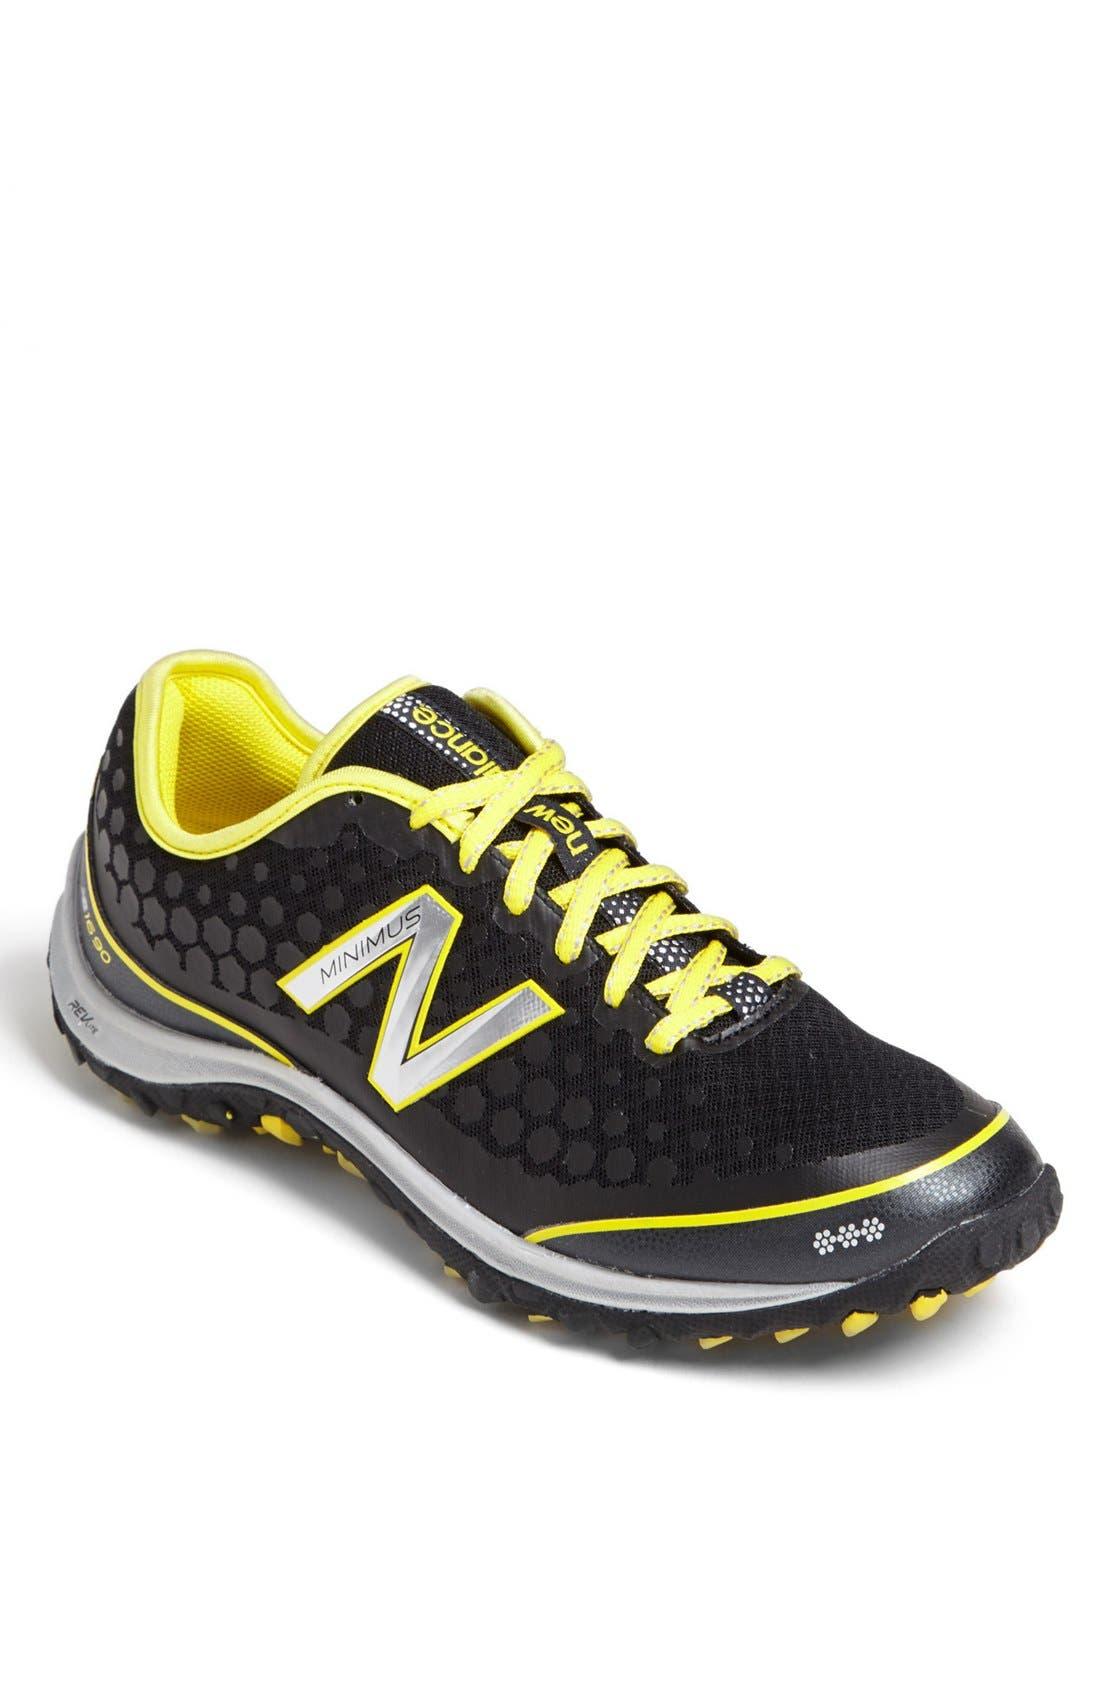 Alternate Image 1 Selected - New Balance 'Minimus 1690' Trail Running Shoe (Men)